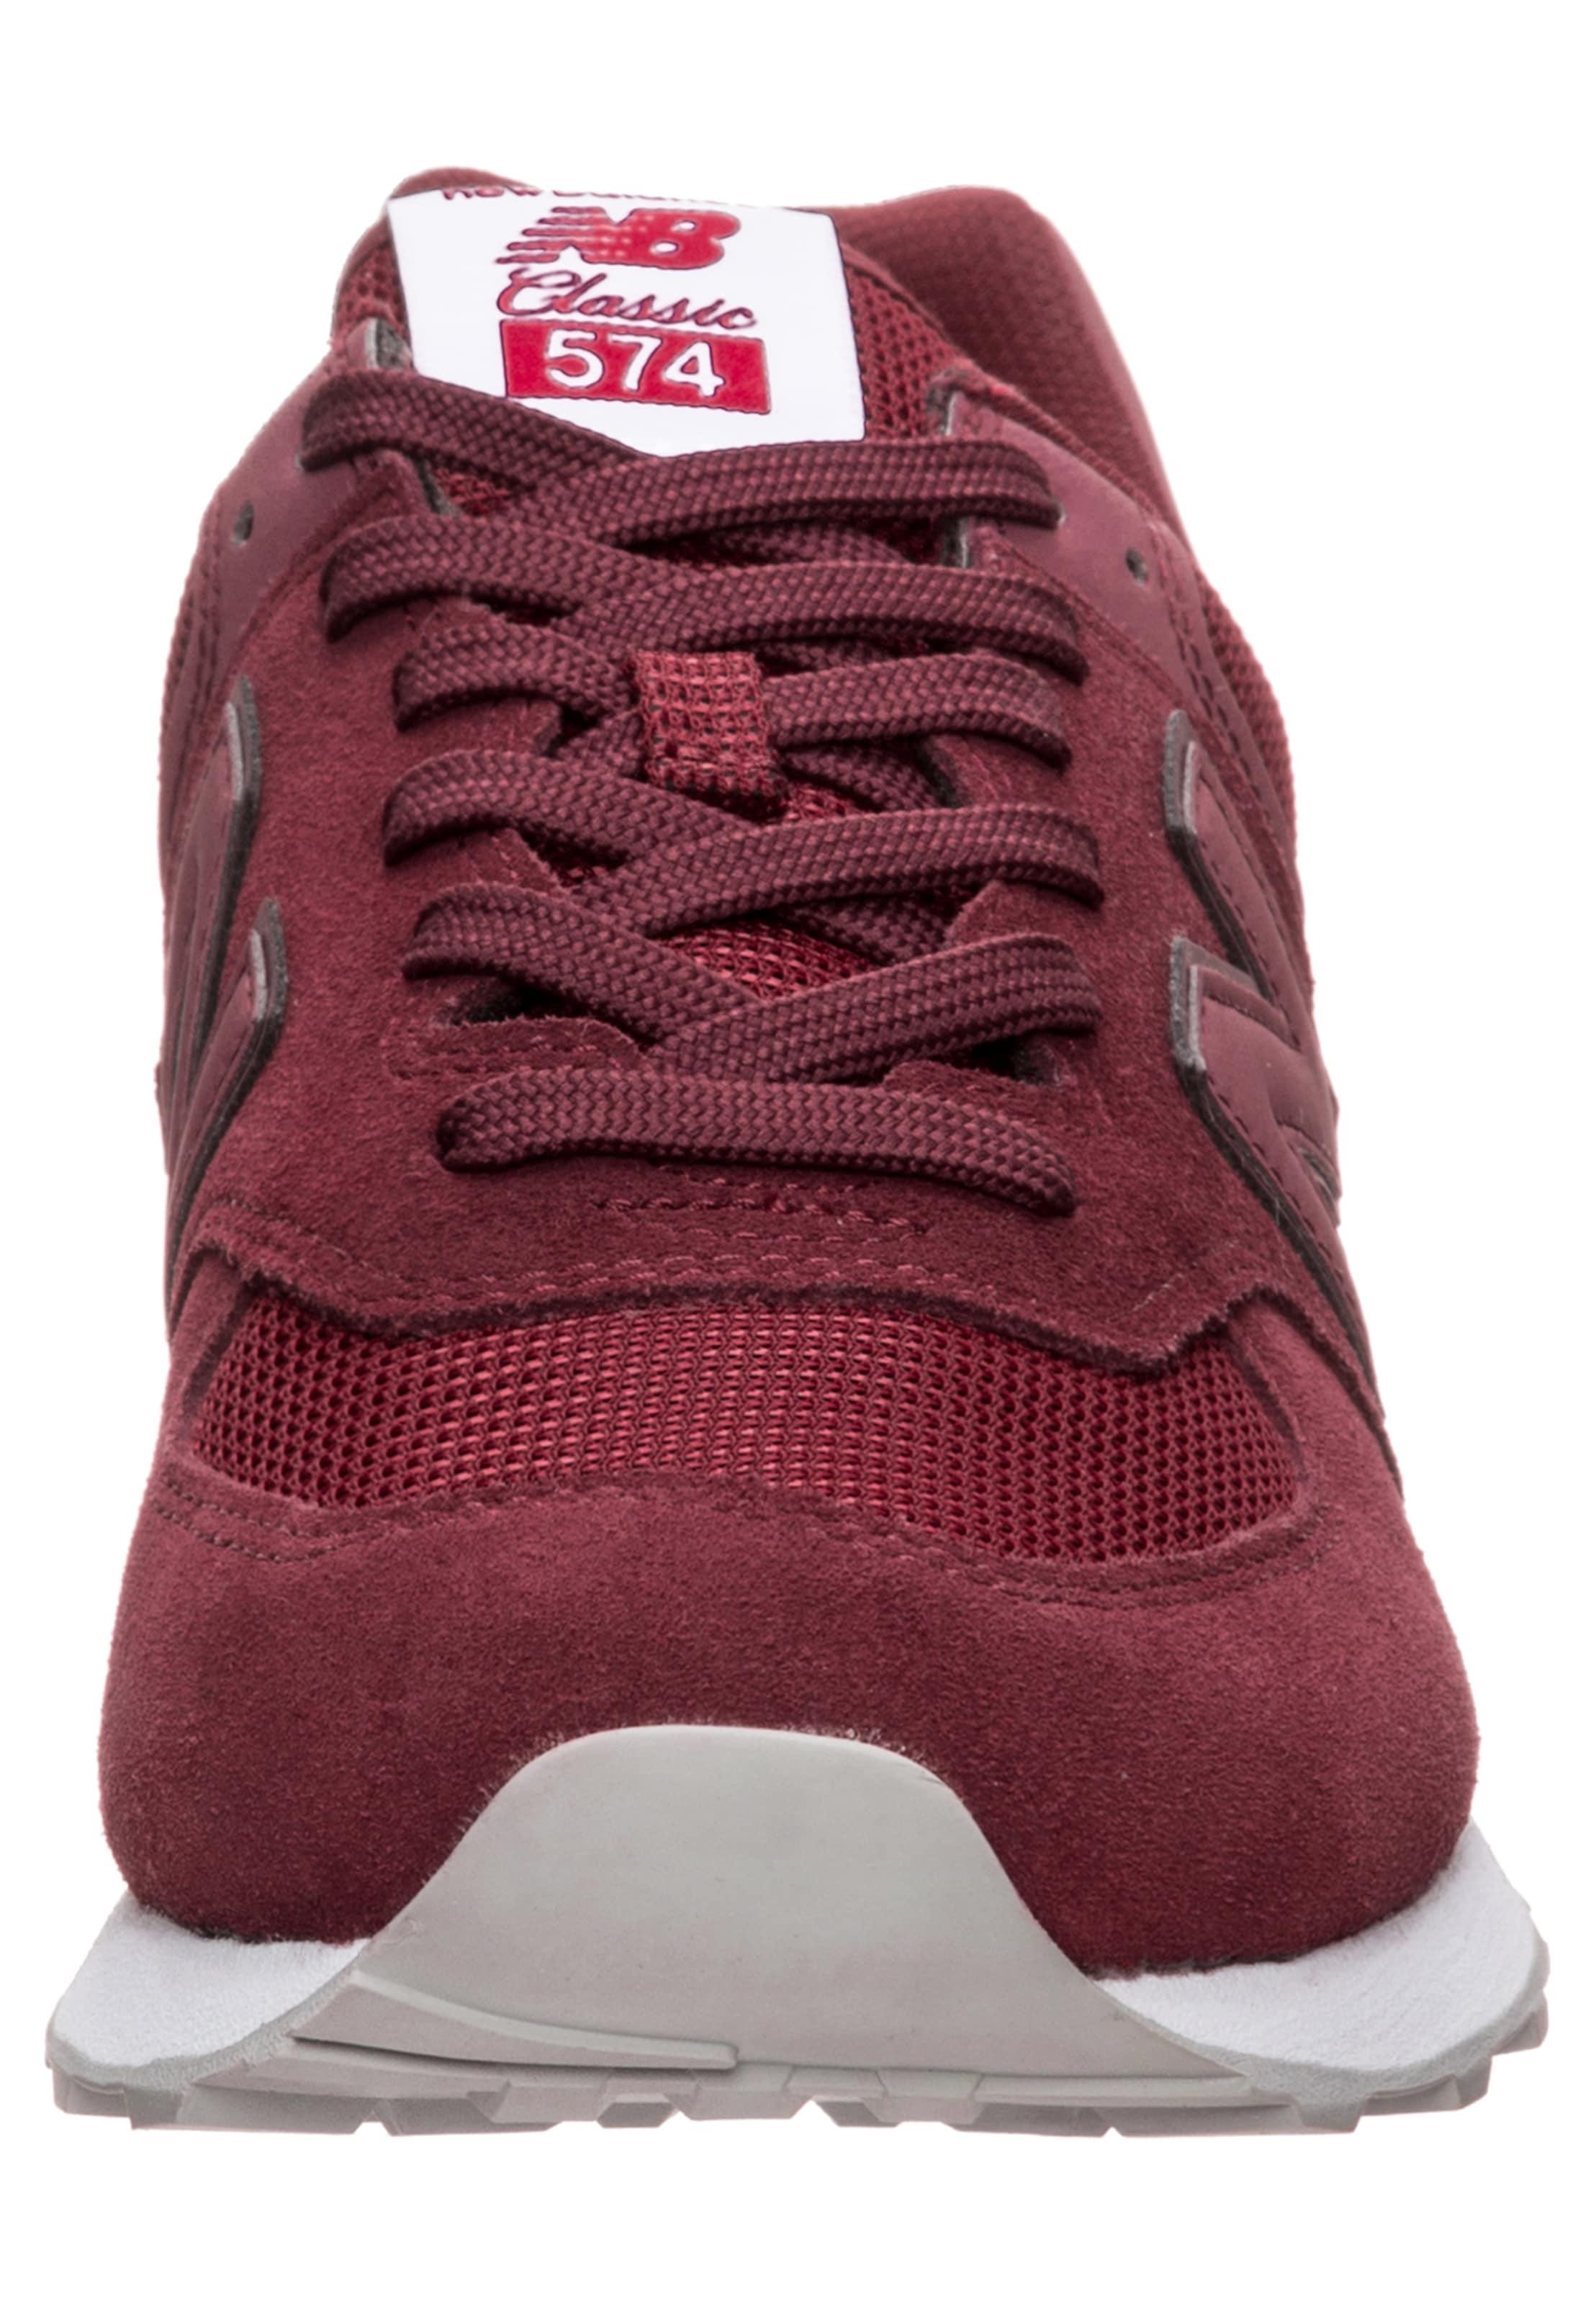 Sneaker In New 'ml574' DunkelrotWeiß Balance DHYeEW29I